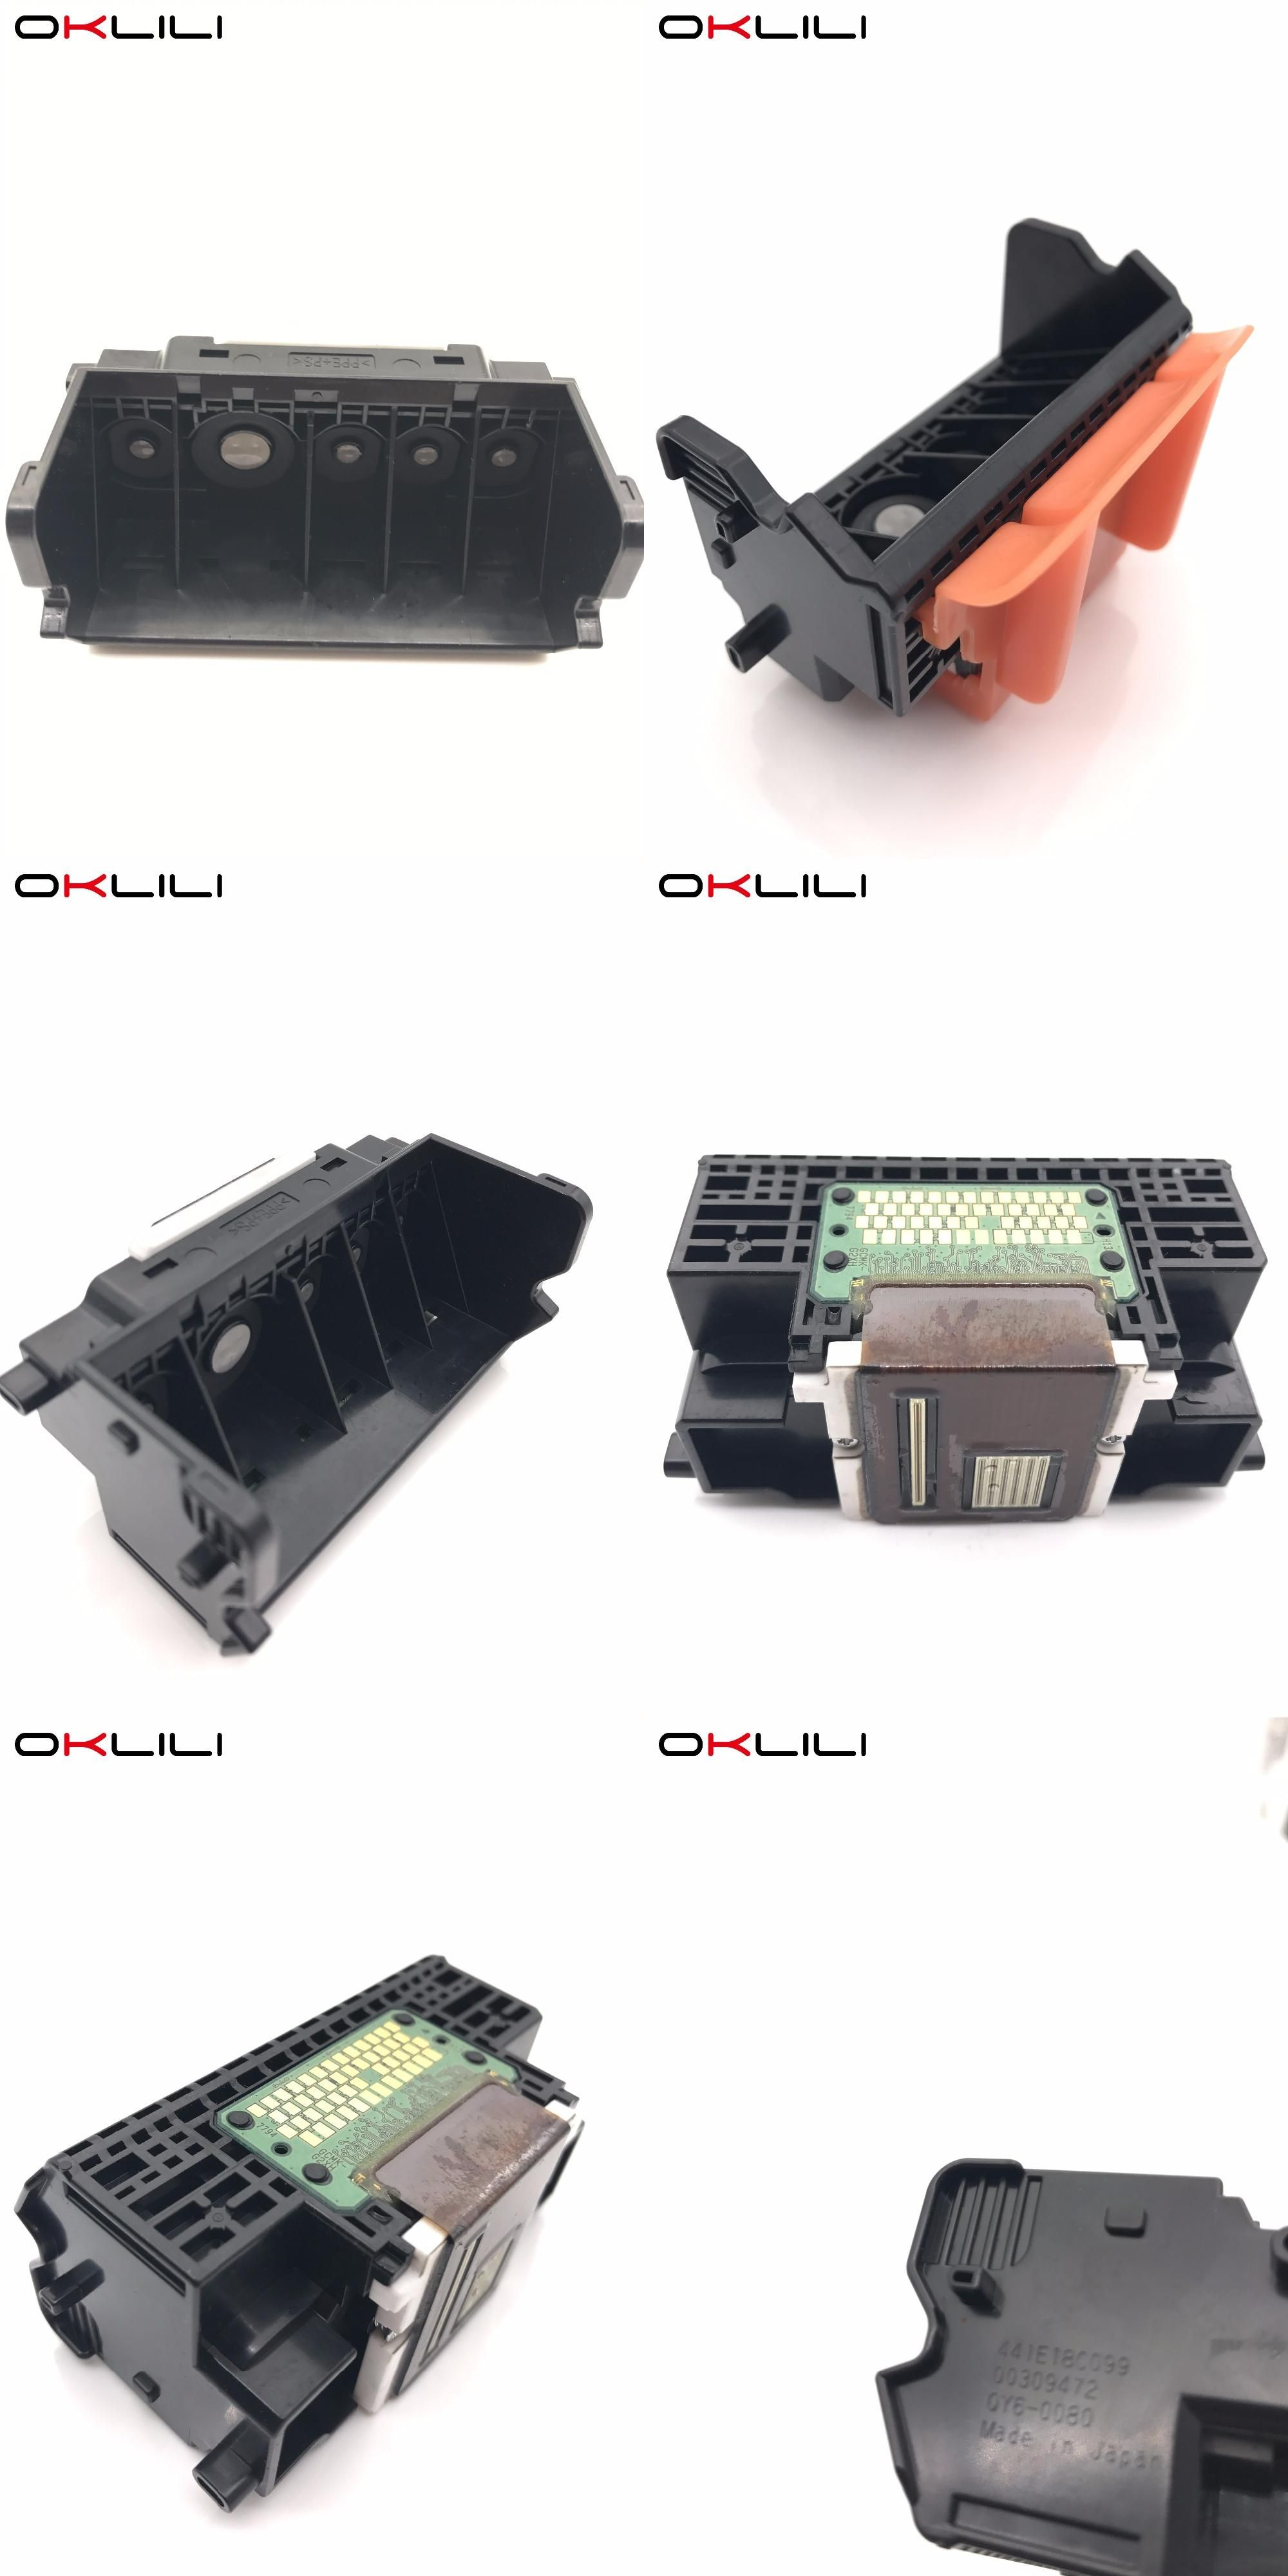 small resolution of  visit to buy oklili qy6 0080 printhead print head printer for canon ip4820 ip4850 ix6520 ix6550 mx715 mx885 mg5220 mg5250 mg5320 mg5350 advertisement